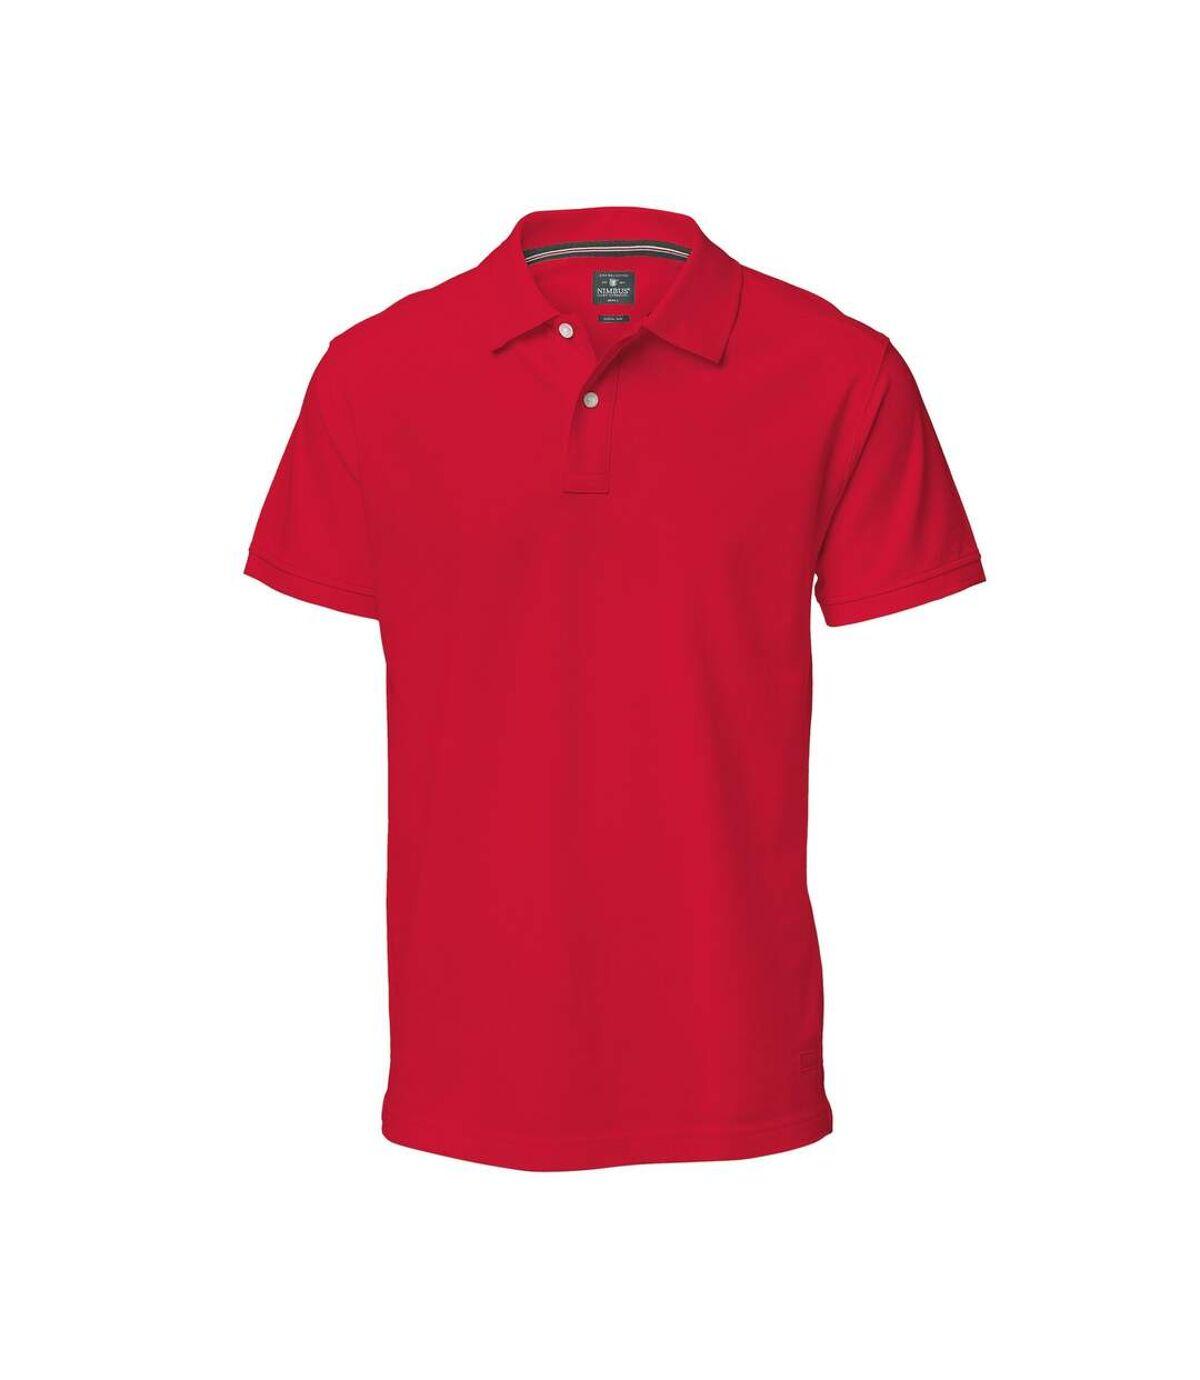 Nimbus Mens Yale Short Sleeve Polo Shirt (Navy) - UTRW3619